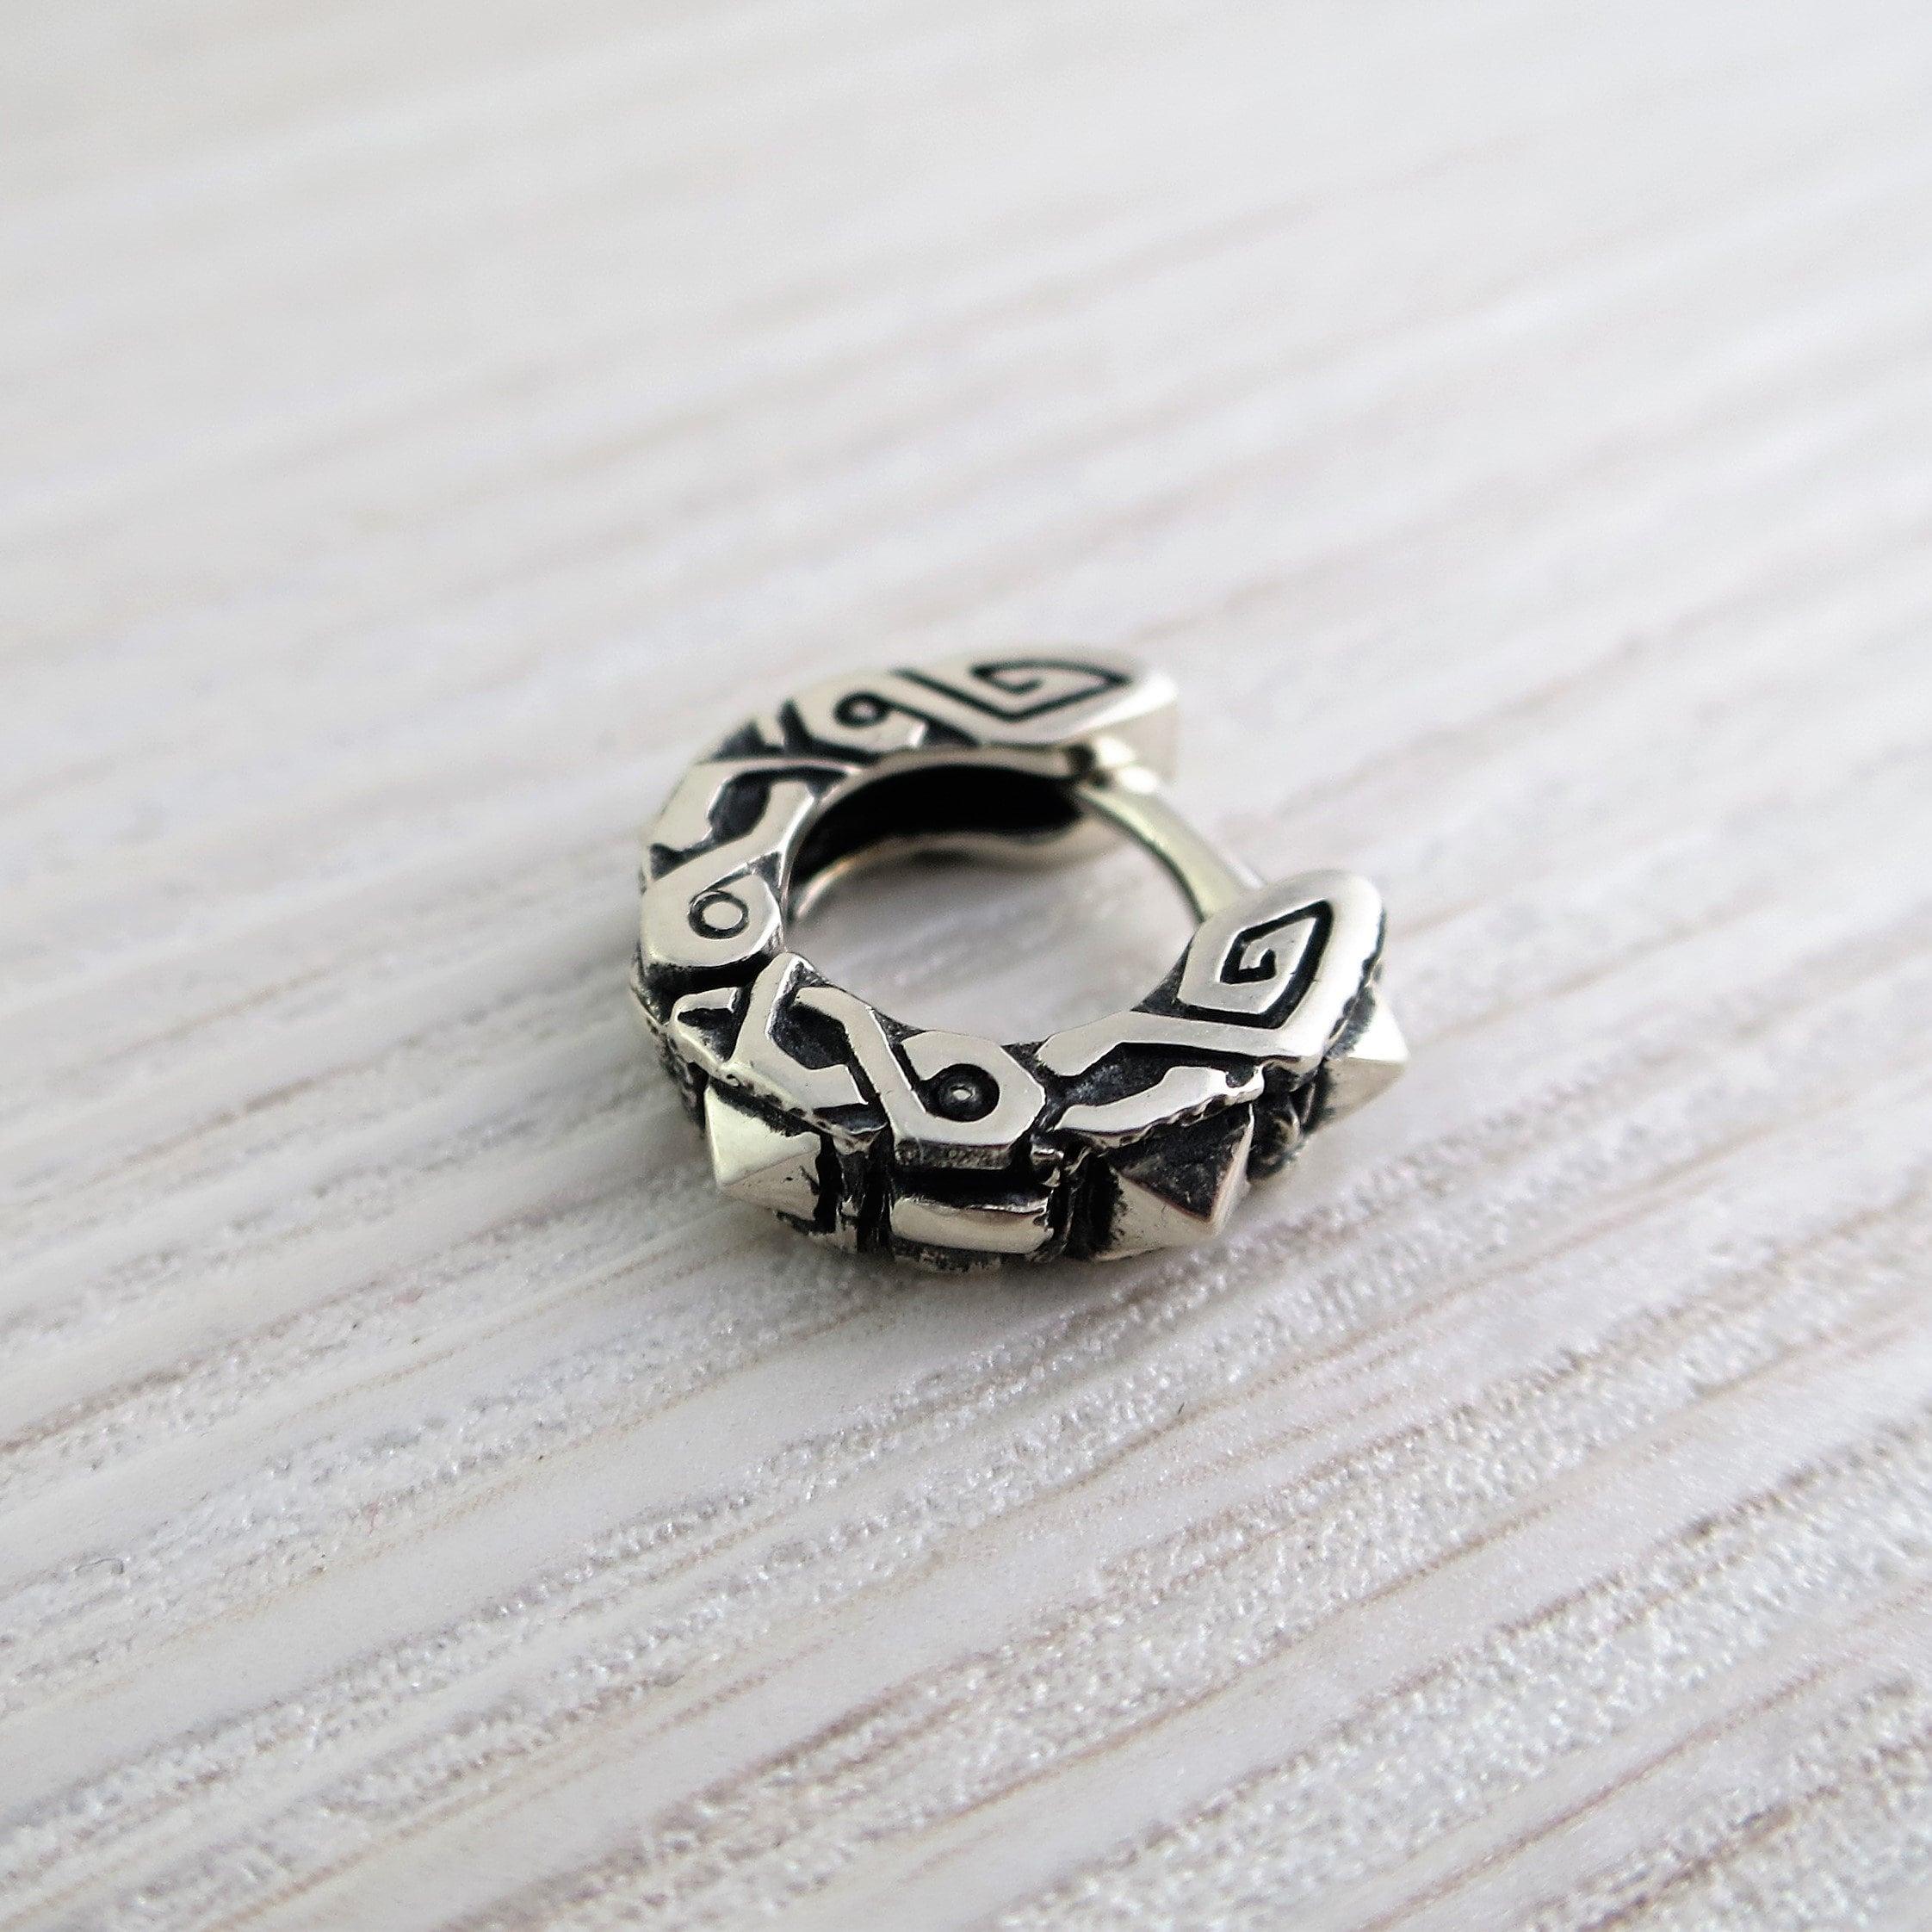 EK054s Thick hoop earrings huggie for men SHIPPING FROM USA Mens earrings spikes sterling silver